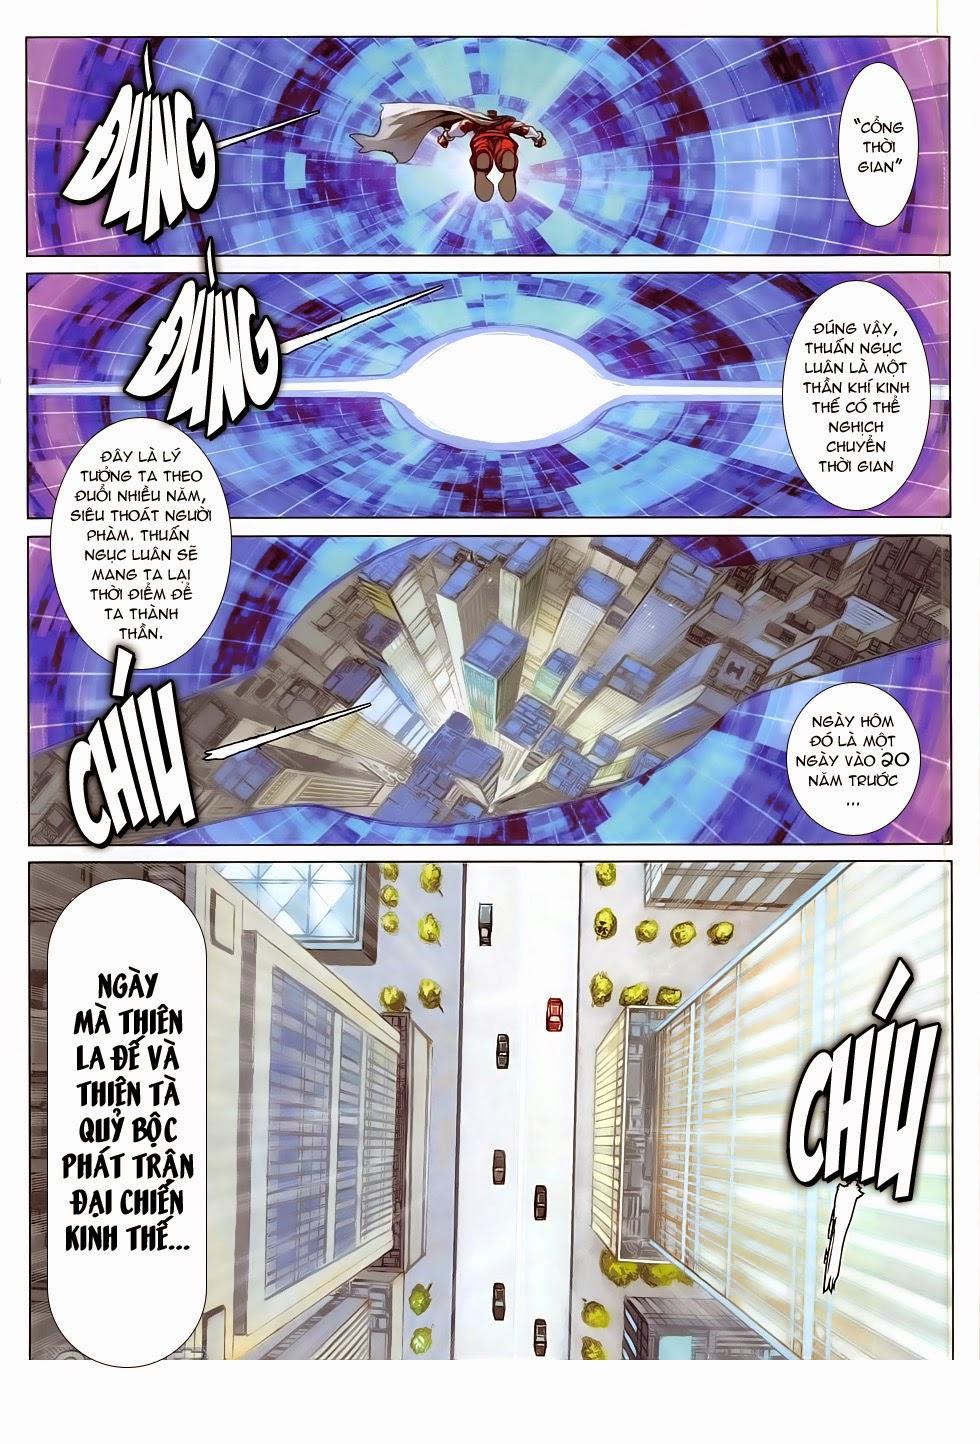 Ba Động Quyền Z Hadouken Zero chap 15 - Trang 4